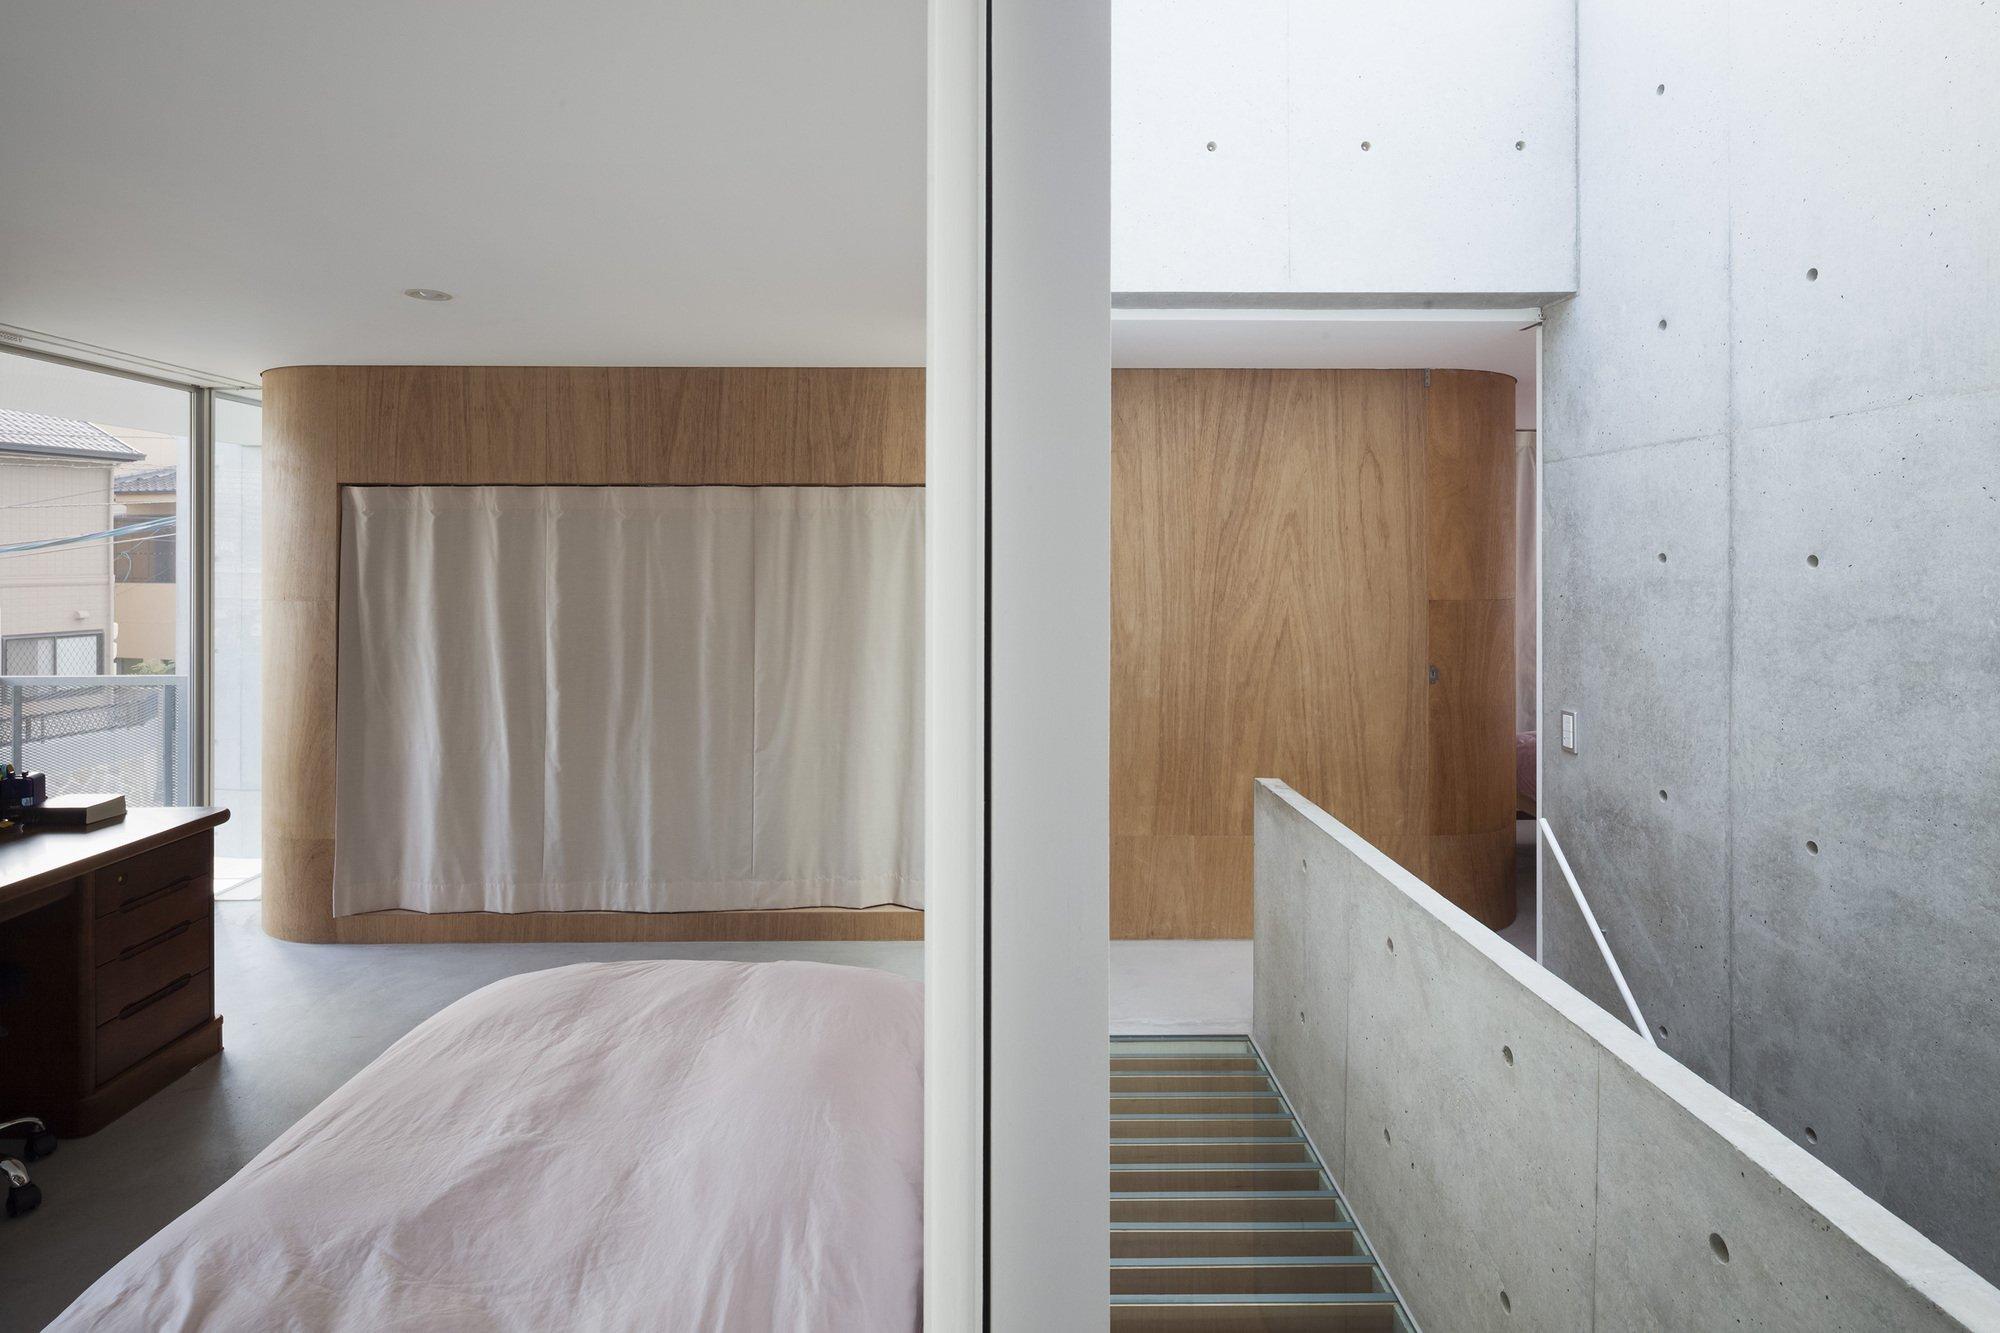 House in Midorigaoka - Yutaka Yoshida Architect & Associates - Japan - Bedrooms - Humble Homes